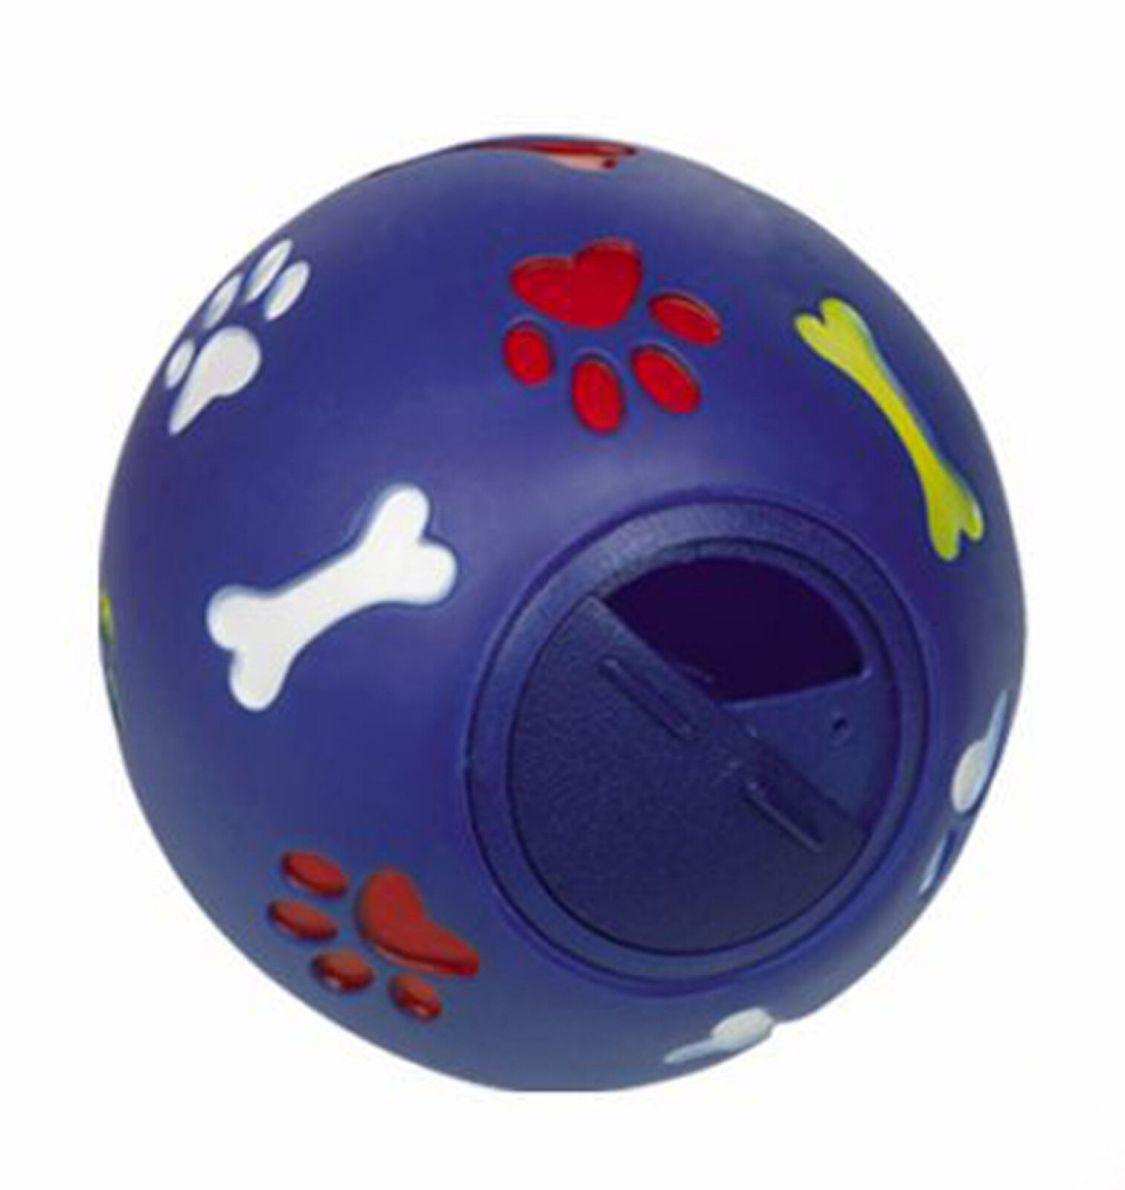 Snackball Futterball Leckerlie Ball 11 cm Intelligenz Hund Lernspielzeug Denkspi